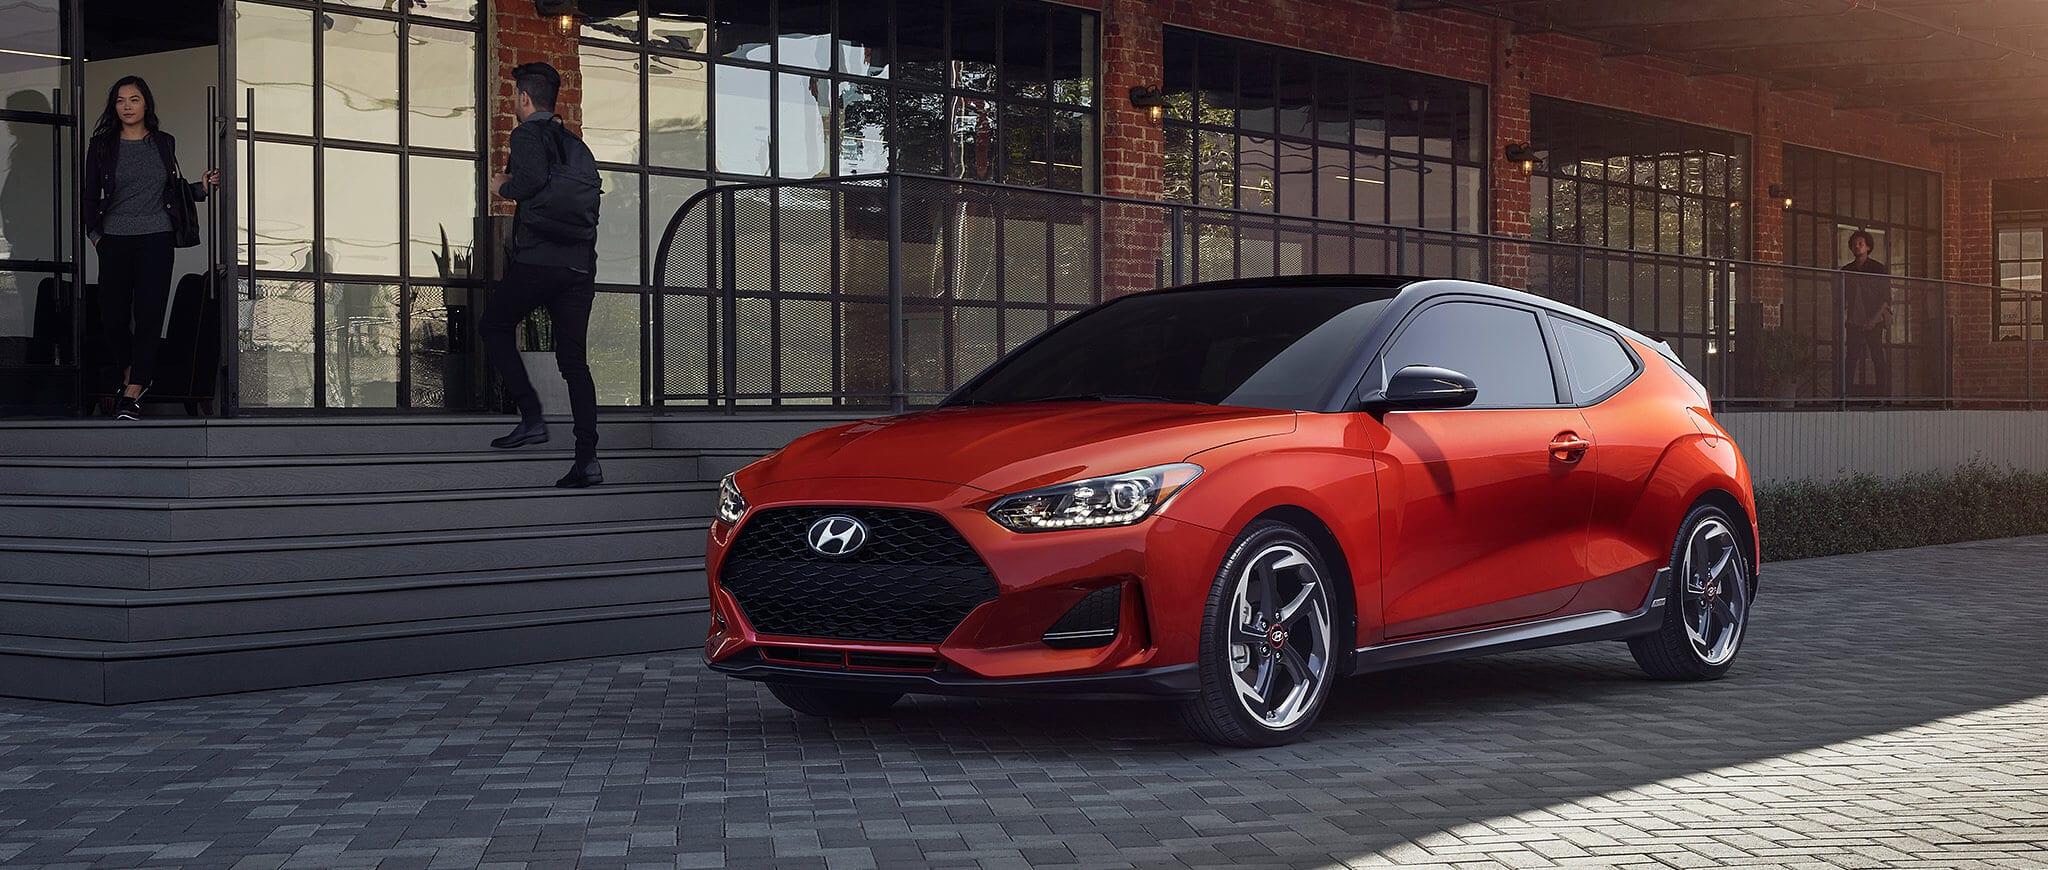 2019 Hyundai Veloster in Staten Island